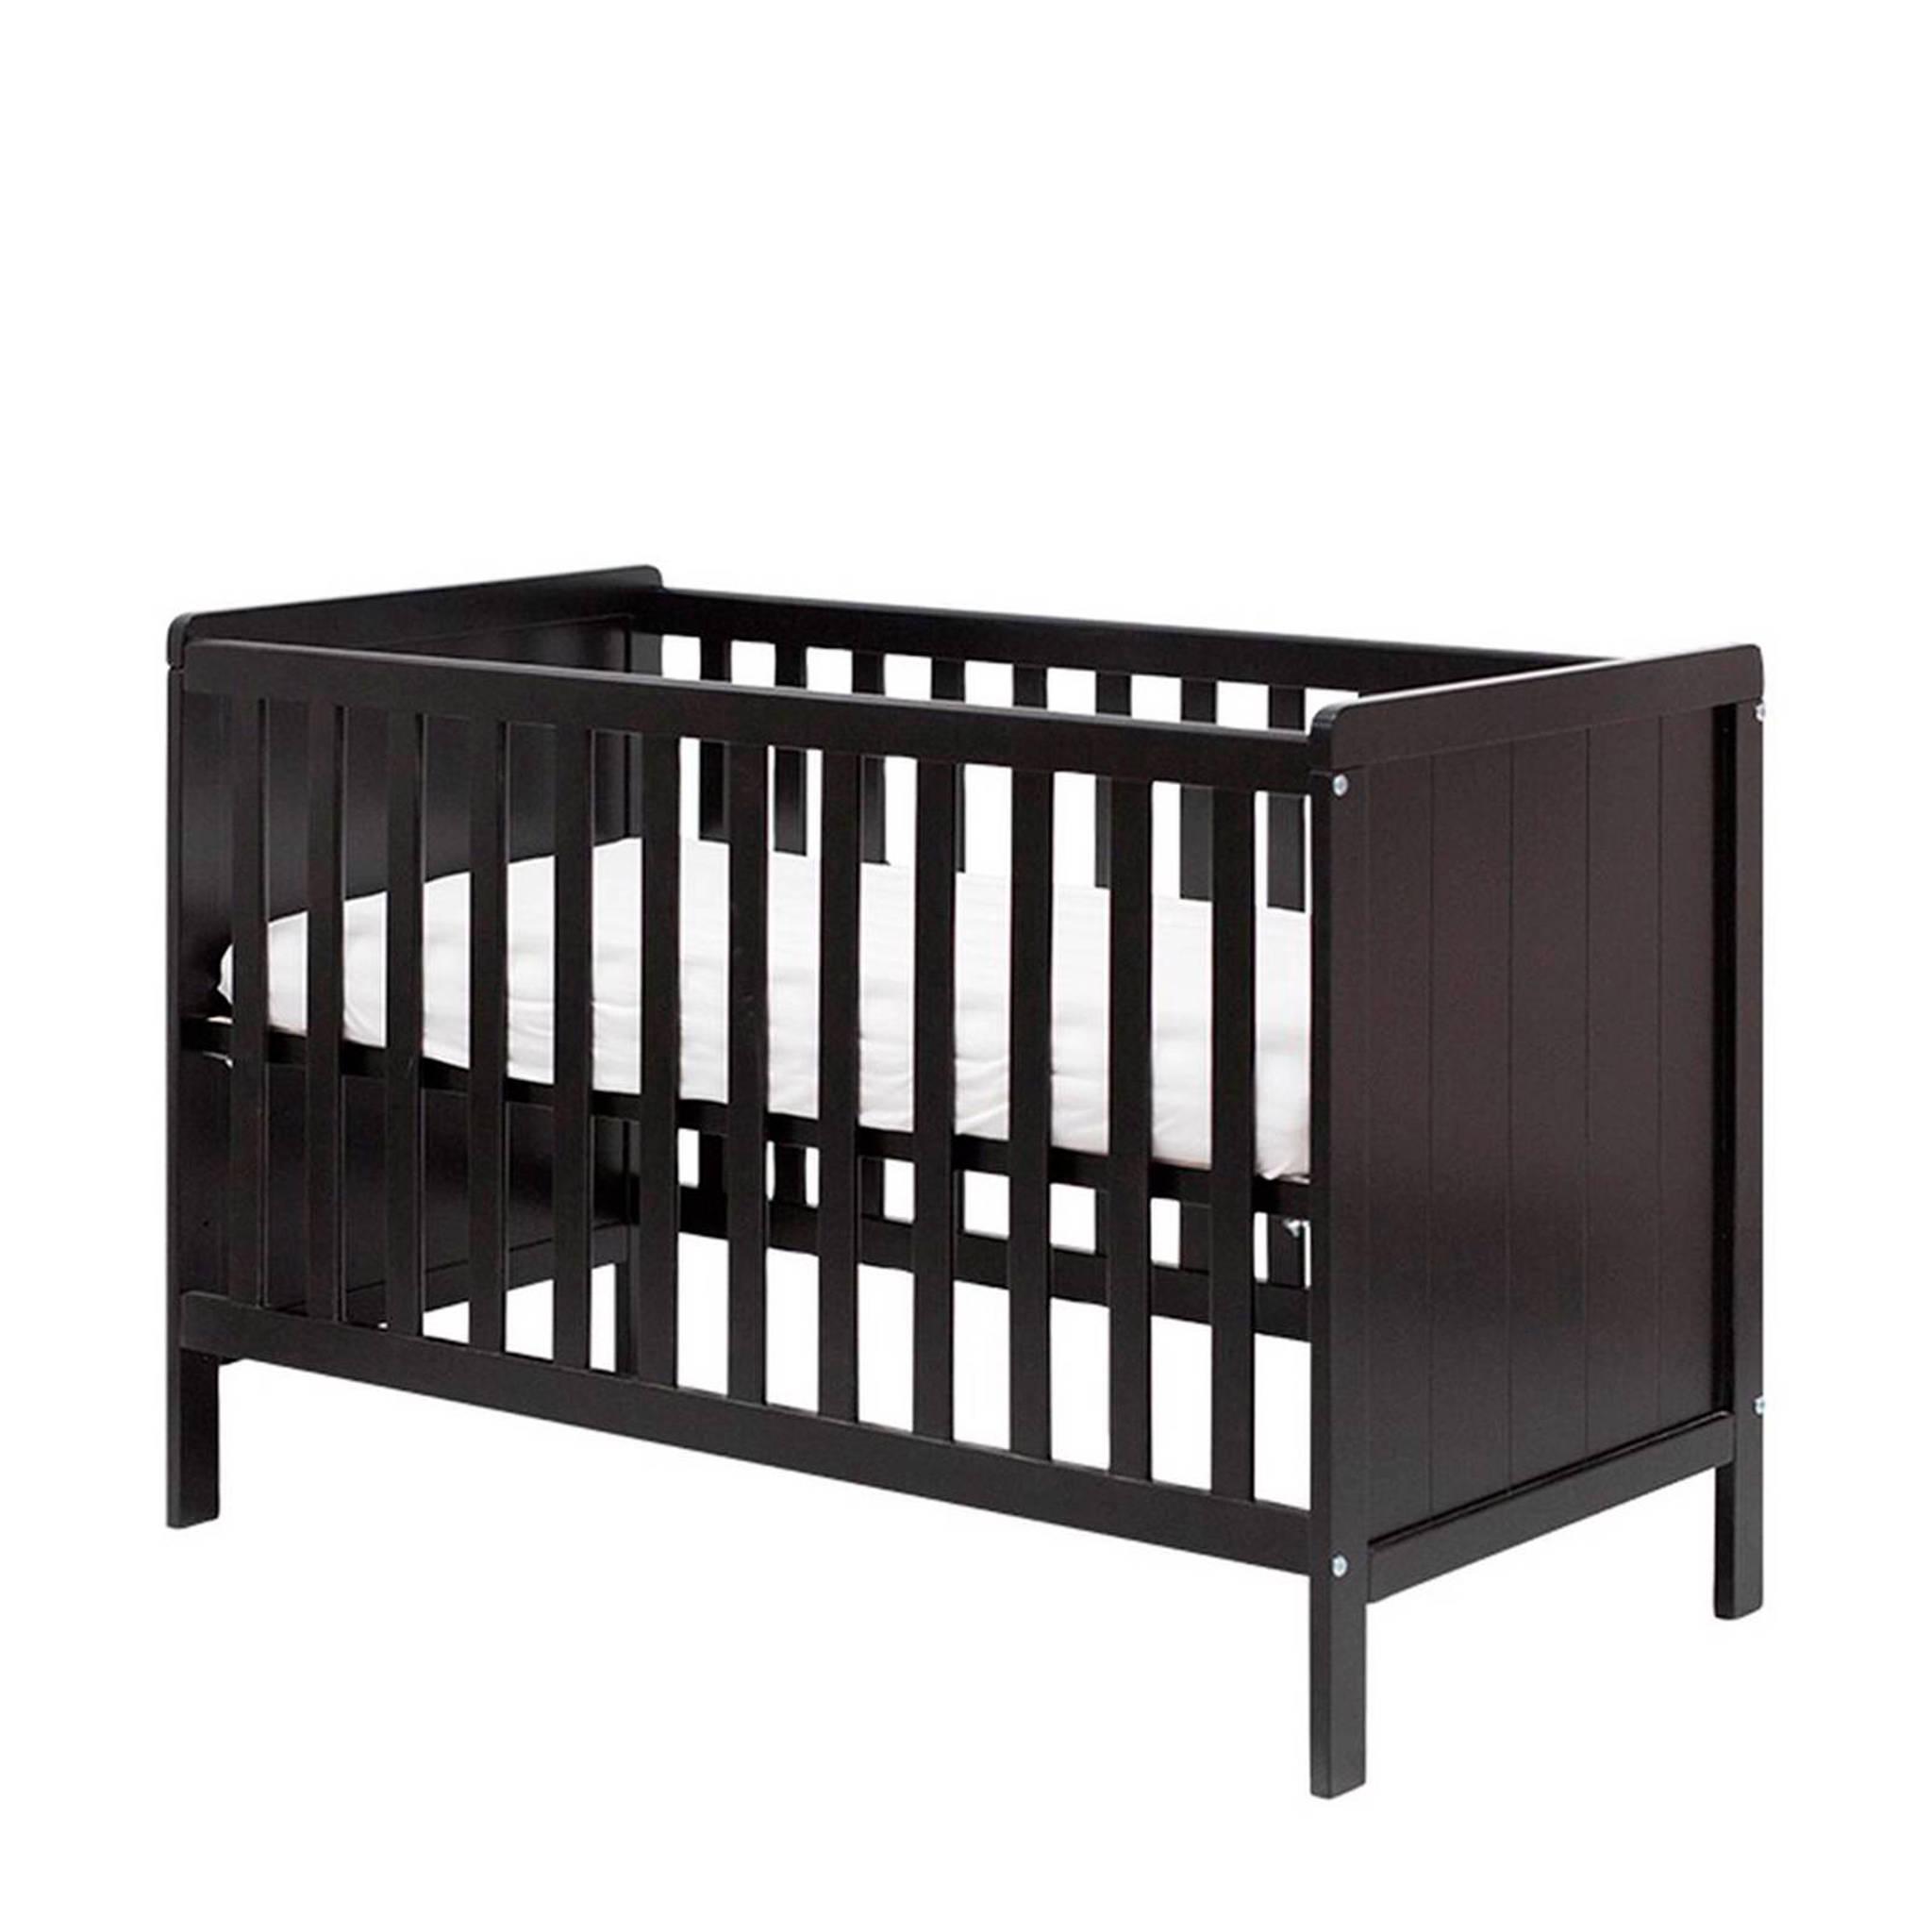 Standaard Afmetingen Babybed.Basicline Ralph Ledikant 60x120 Cm Zwart Wehkamp